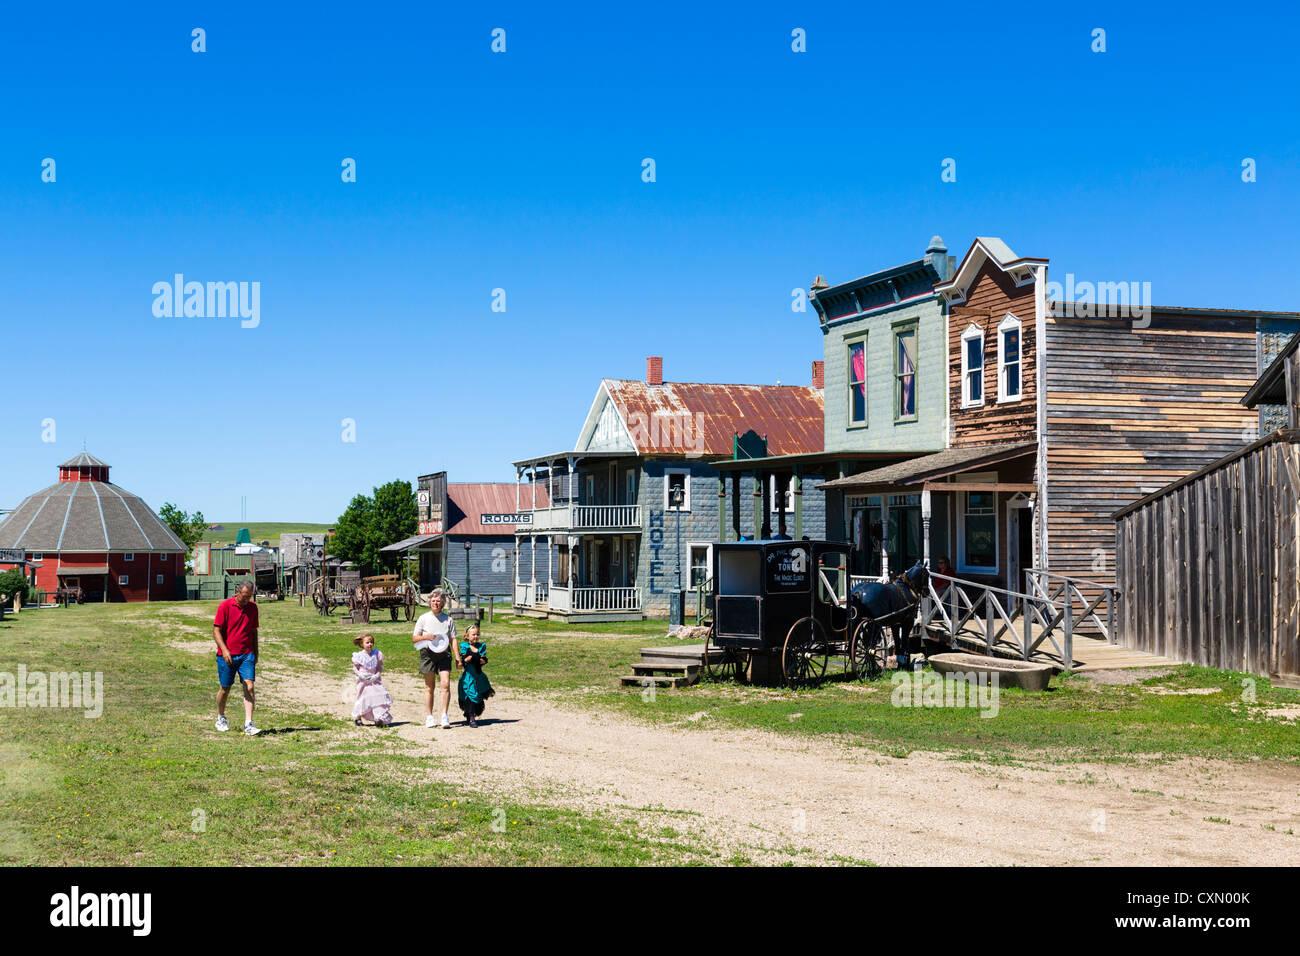 Strada principale di '1880 città western attrazione di Murdo, Dakota del Sud, STATI UNITI D'AMERICA Immagini Stock